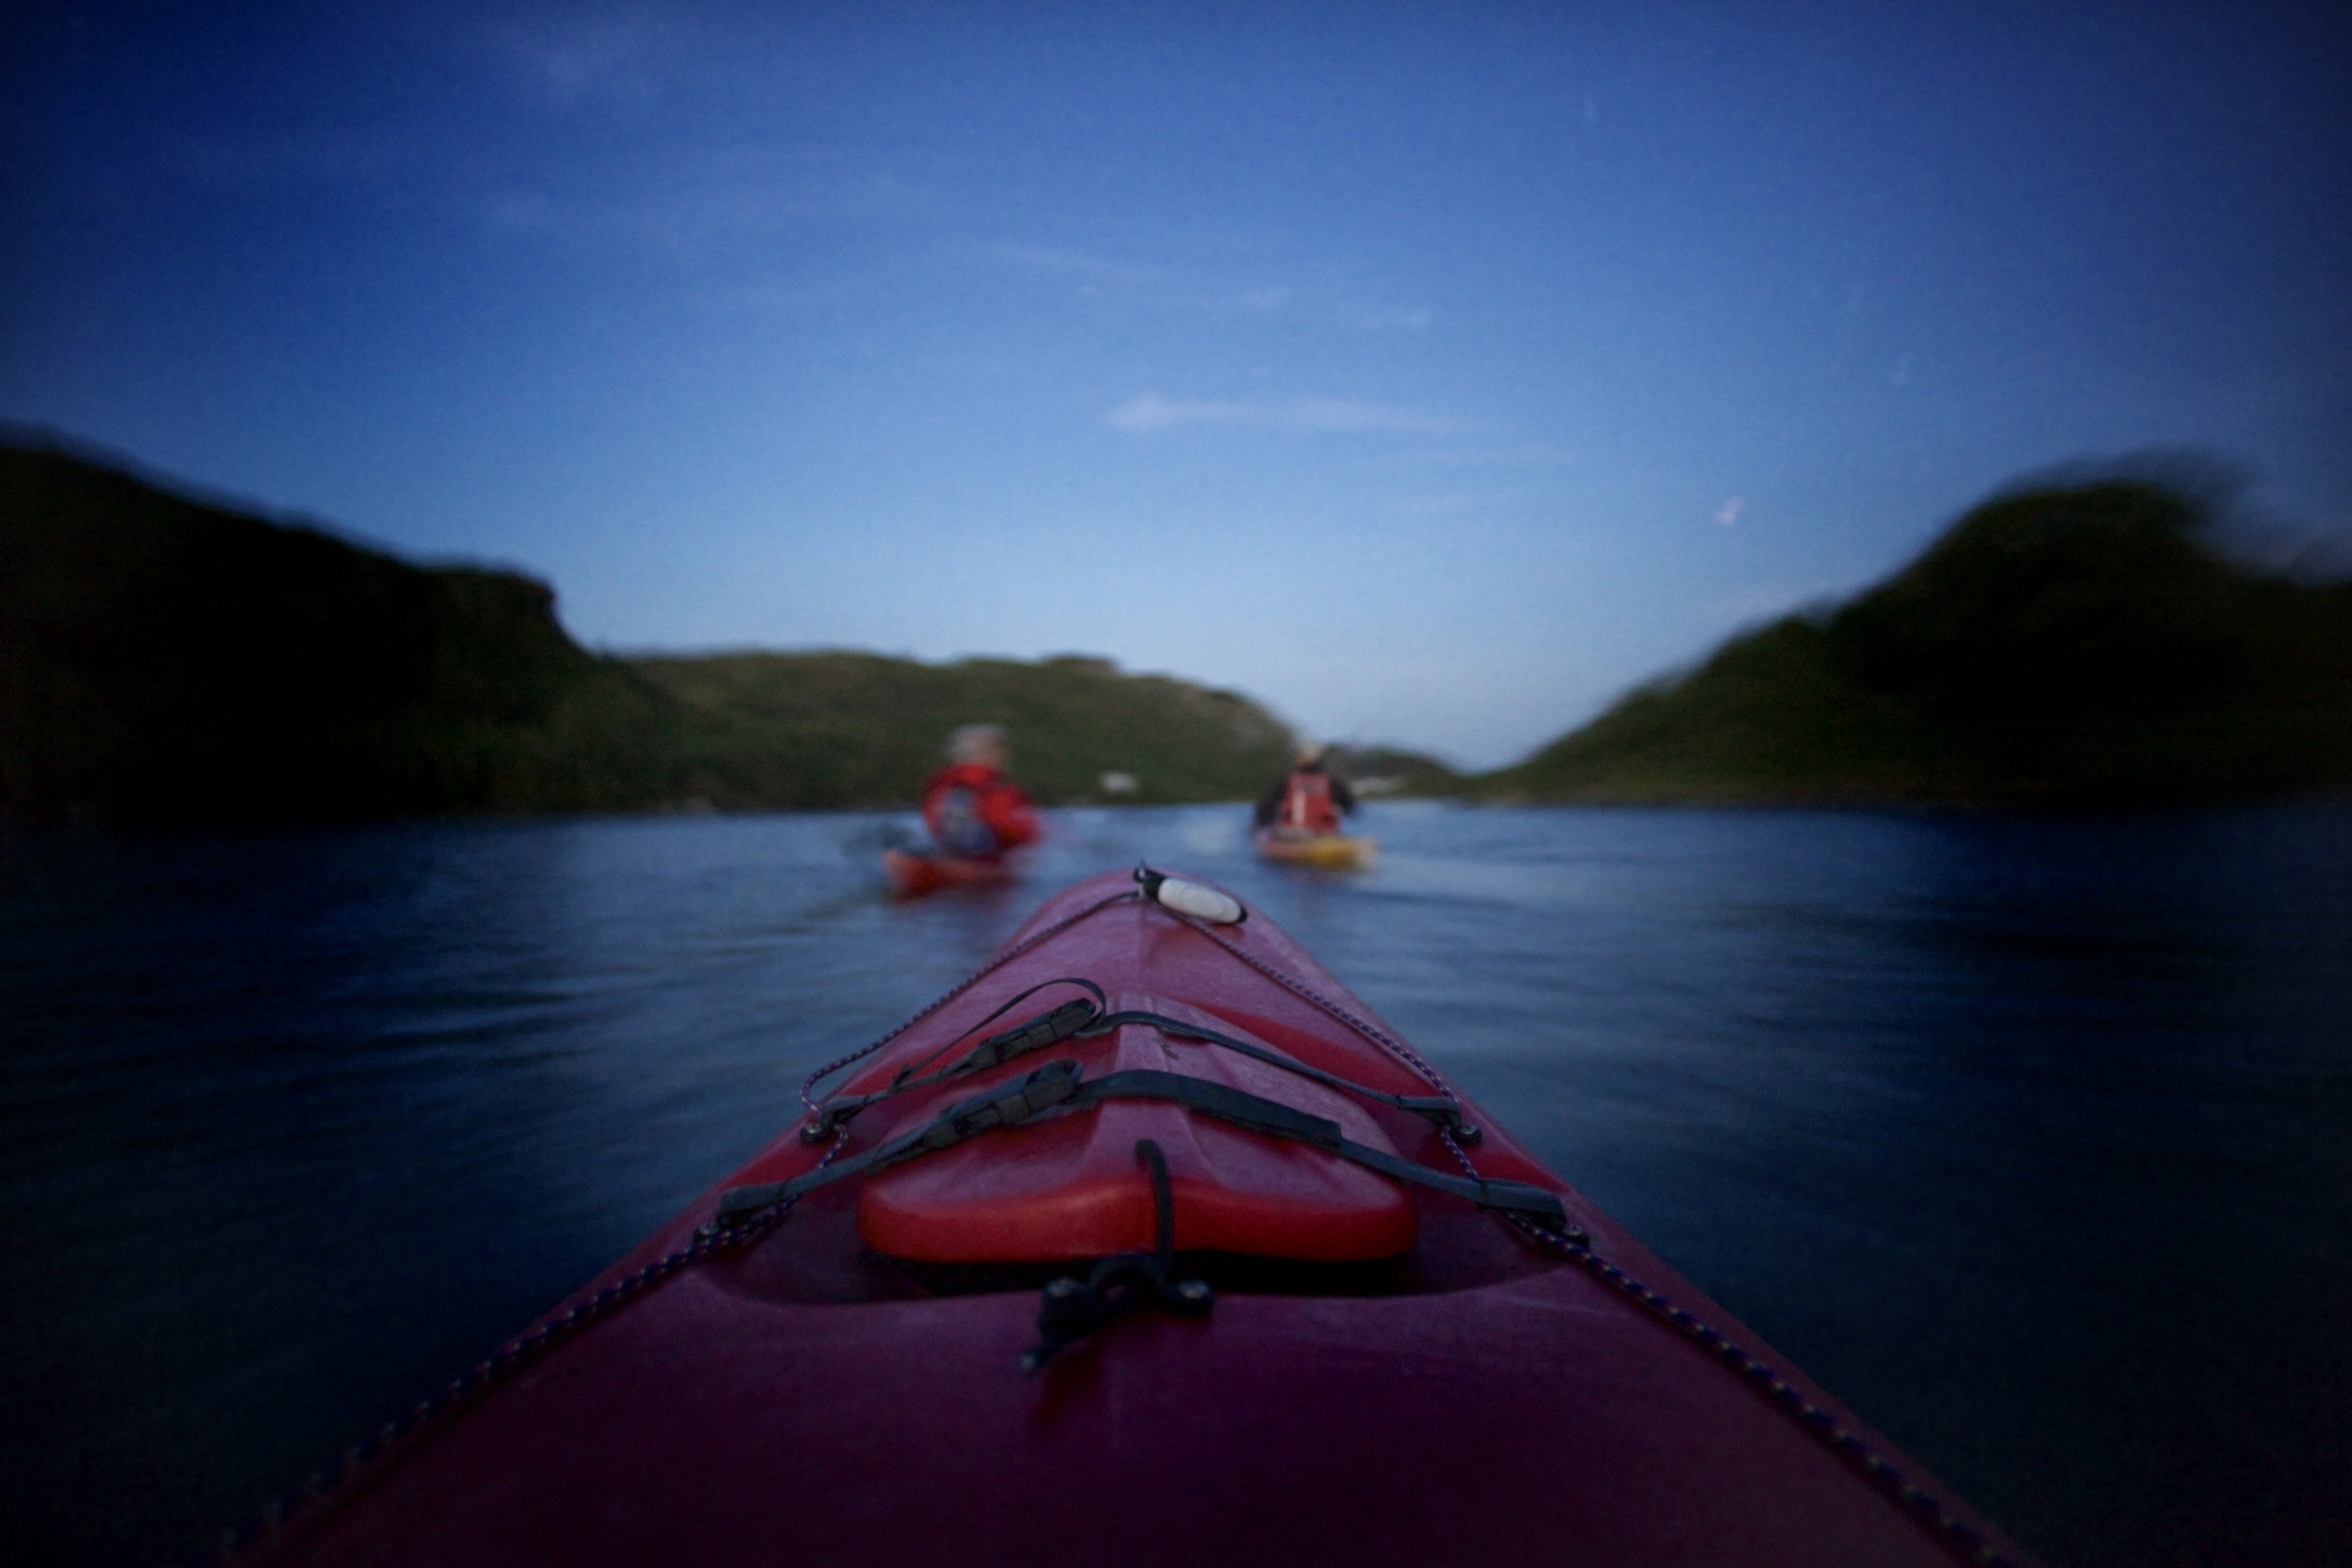 Lough Hyne by kayak (night)